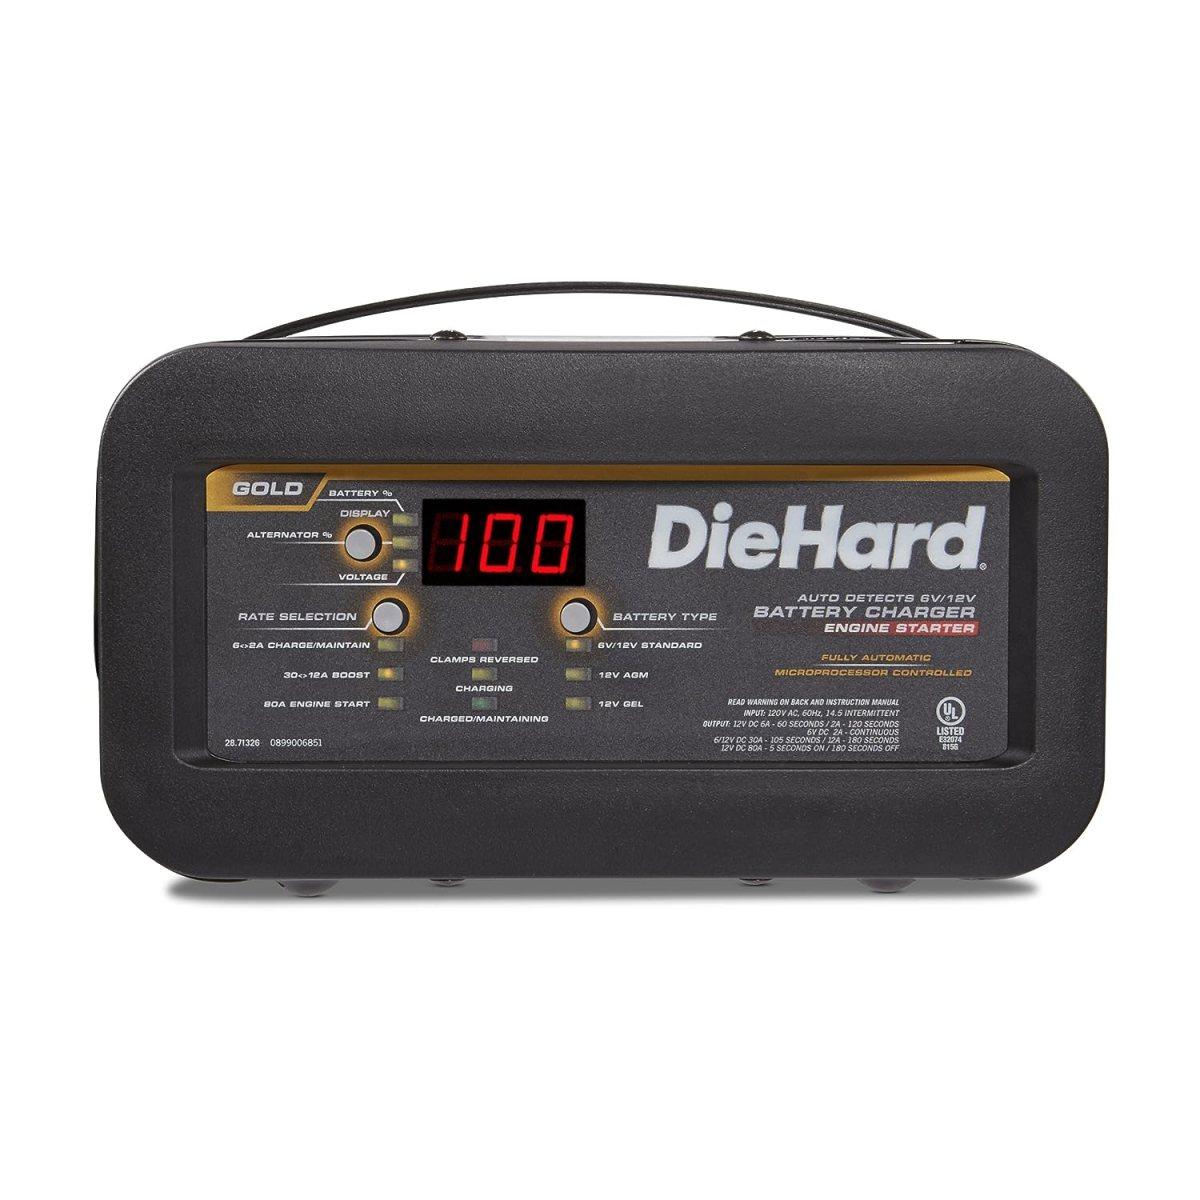 Best Jump Starters DieHard 71326 6/12V Gold Shelf Smart Battery Charger